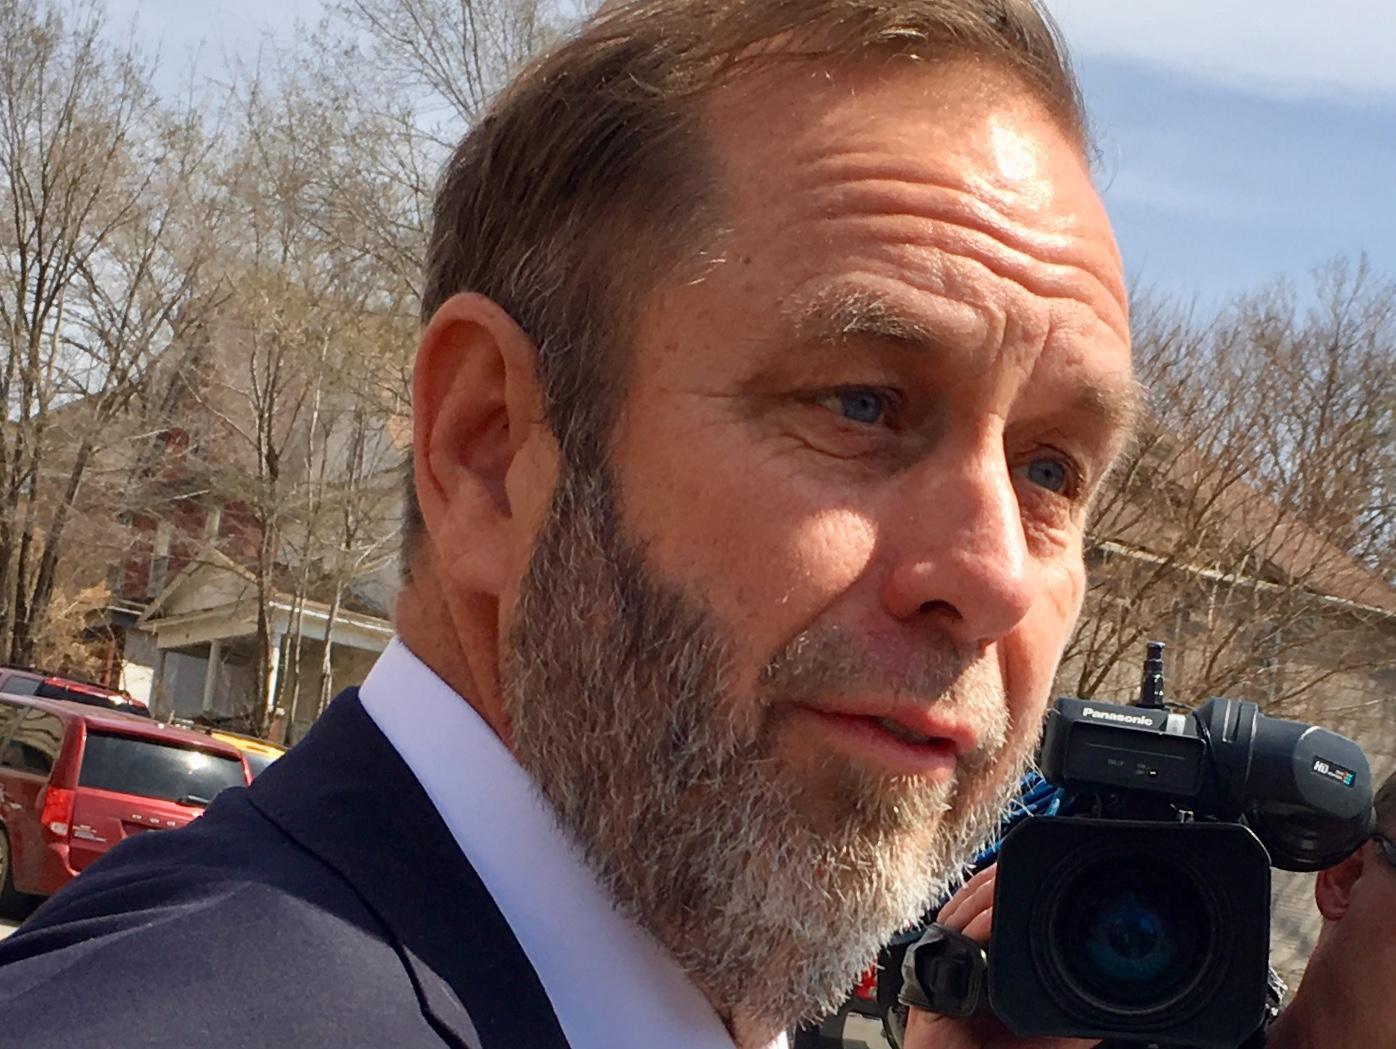 Schlitterbahn Co-Owner Pleads Not Guilty in Kansas City